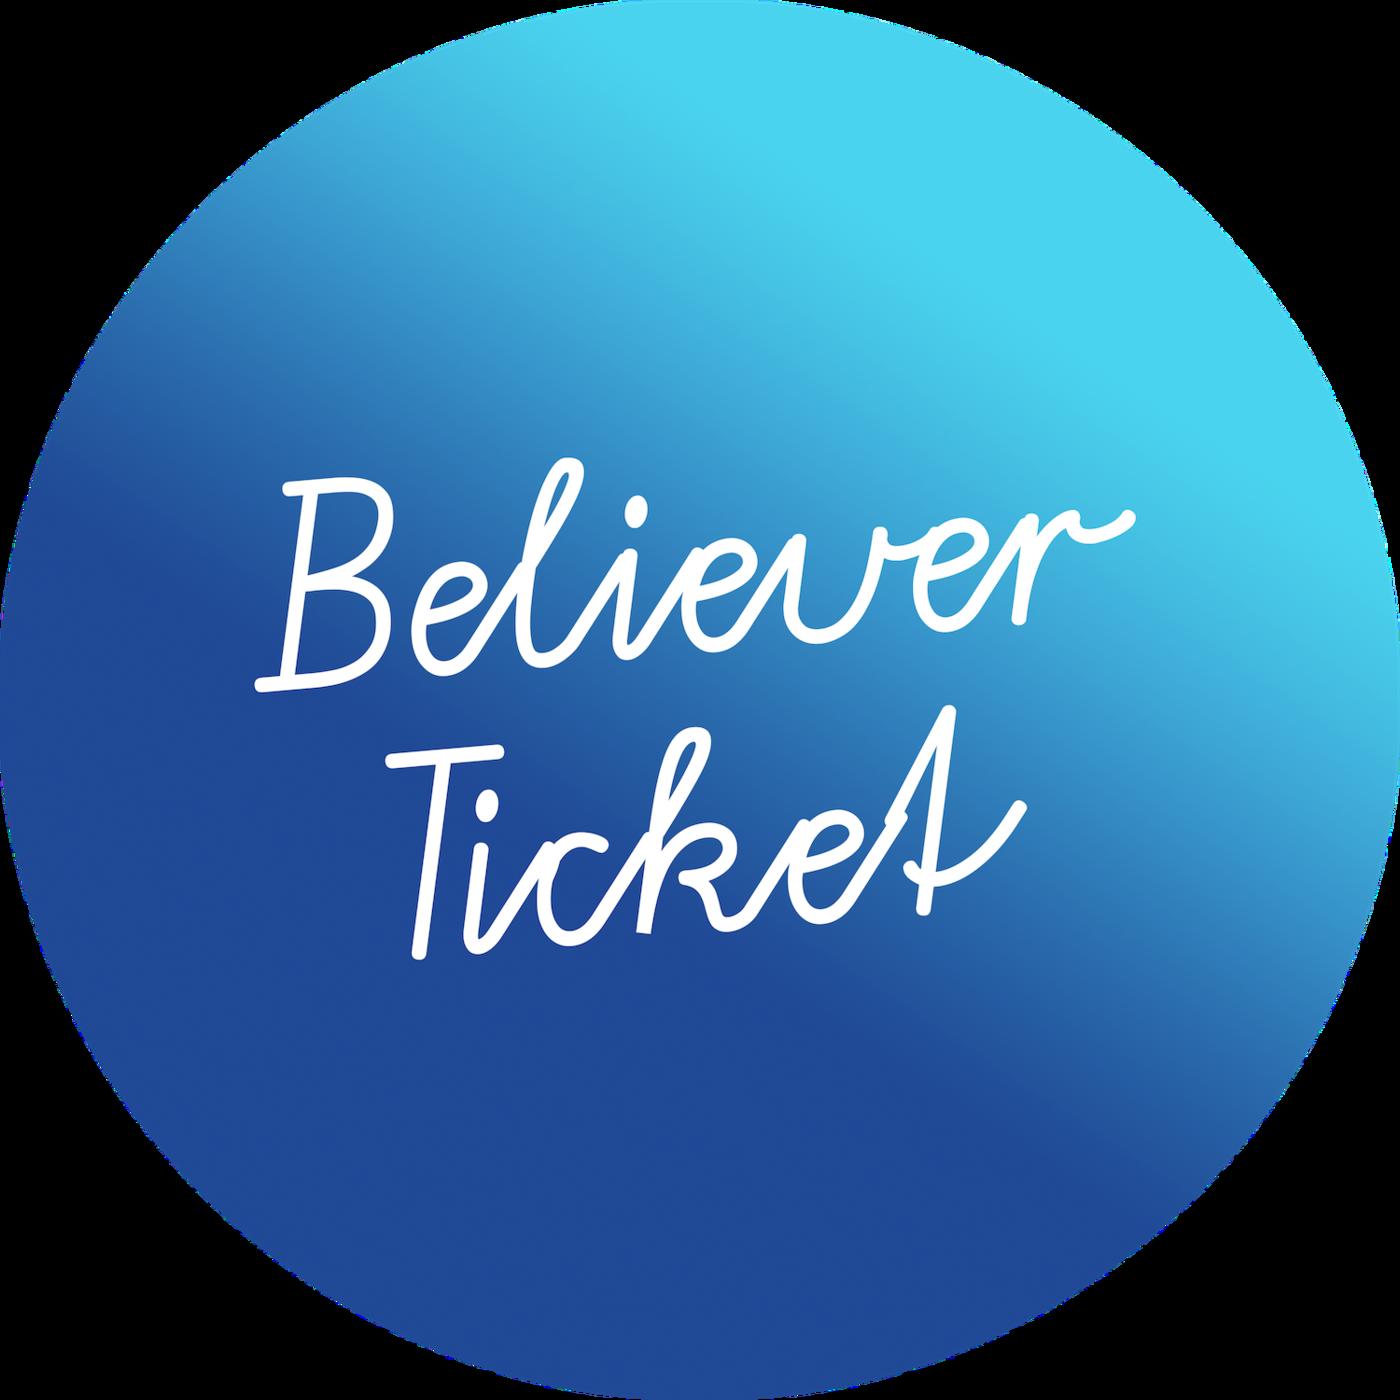 Believer ticket2 icon